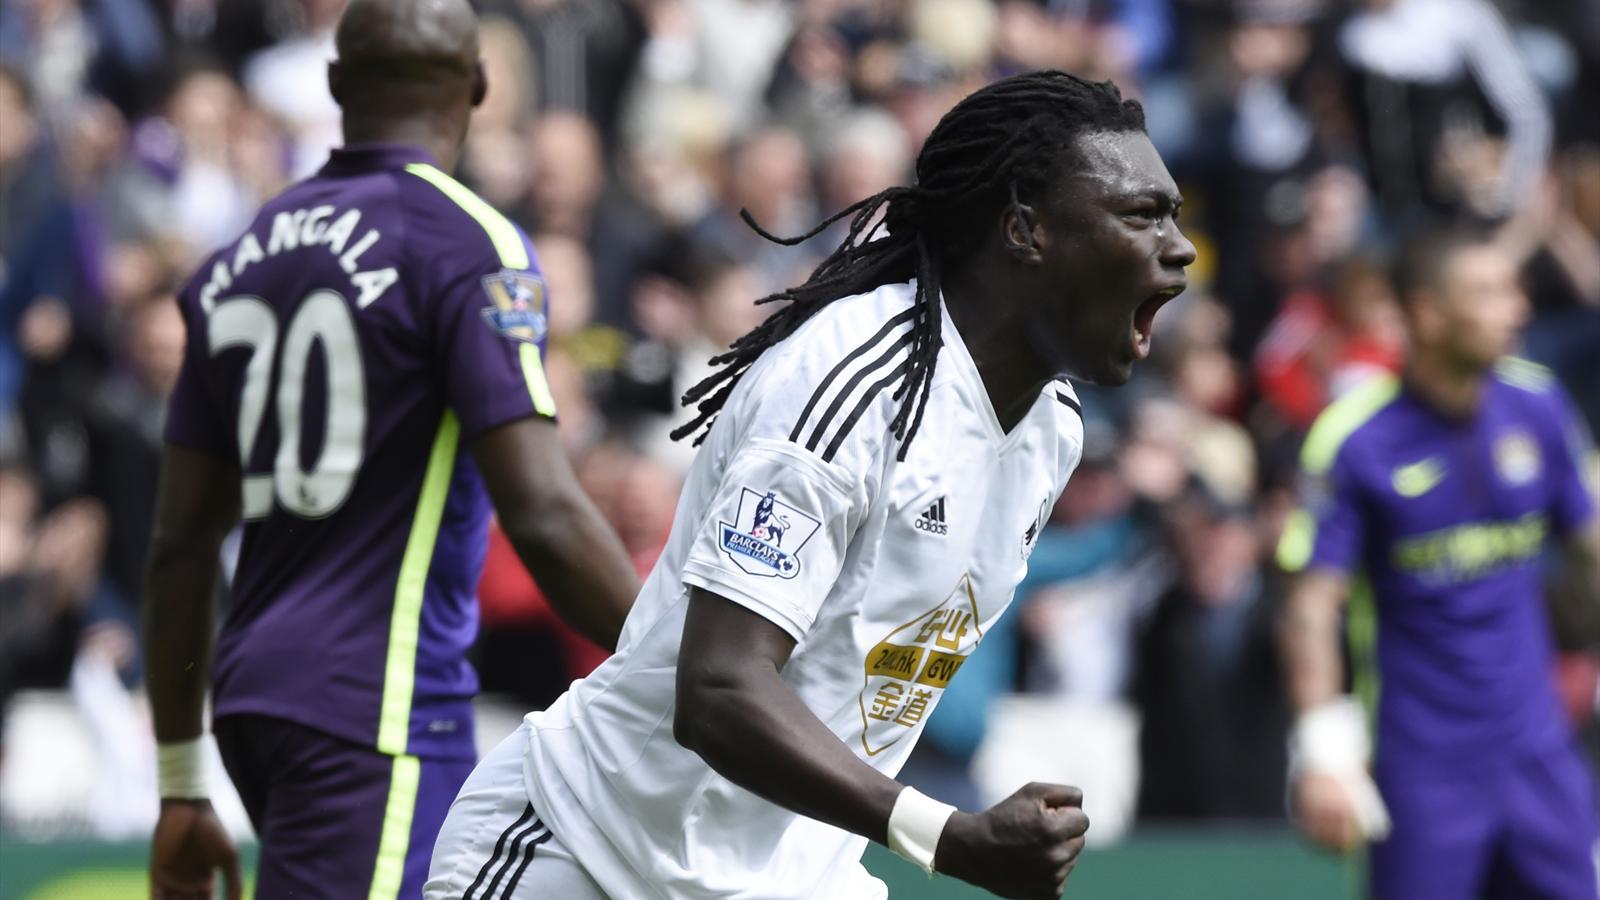 Bafetimbi Gomis scored a fine equaliser for Swansea against Manchester City